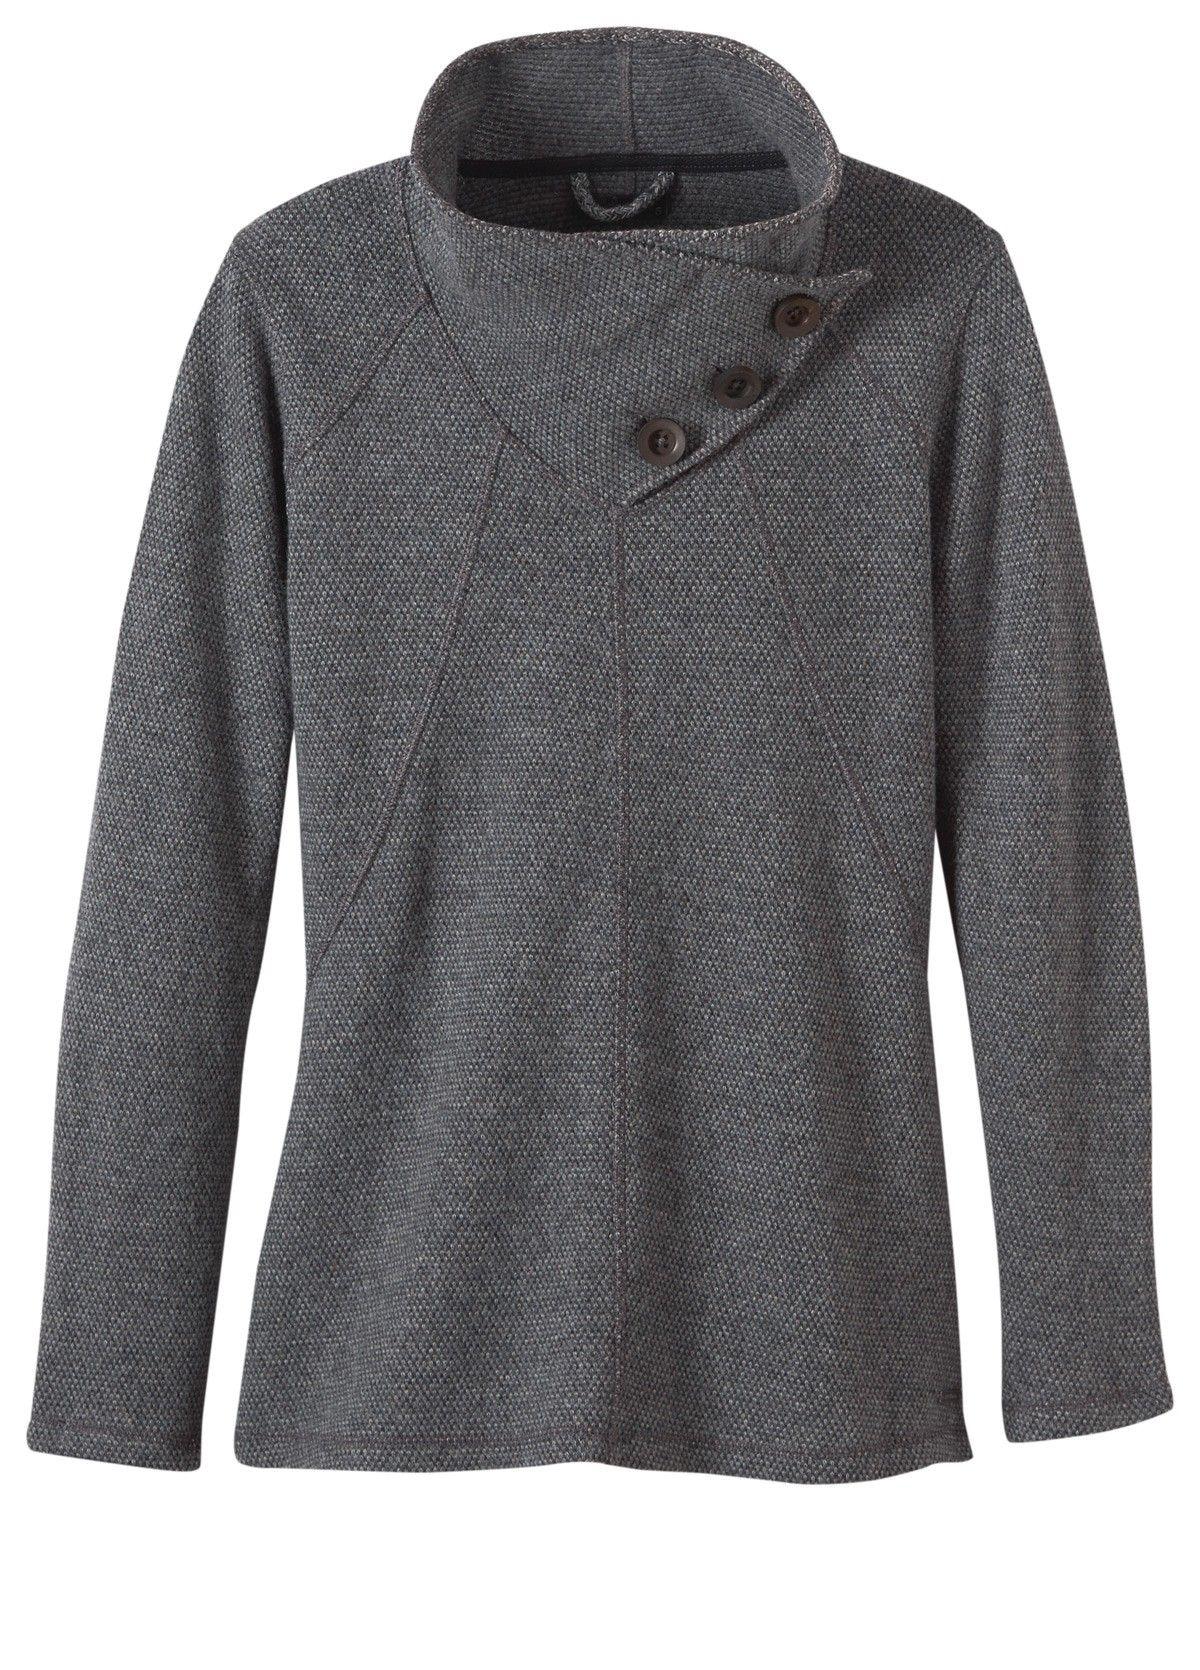 Ebba Tunic Sweater | Tunic sweater, Tunics and Neckline